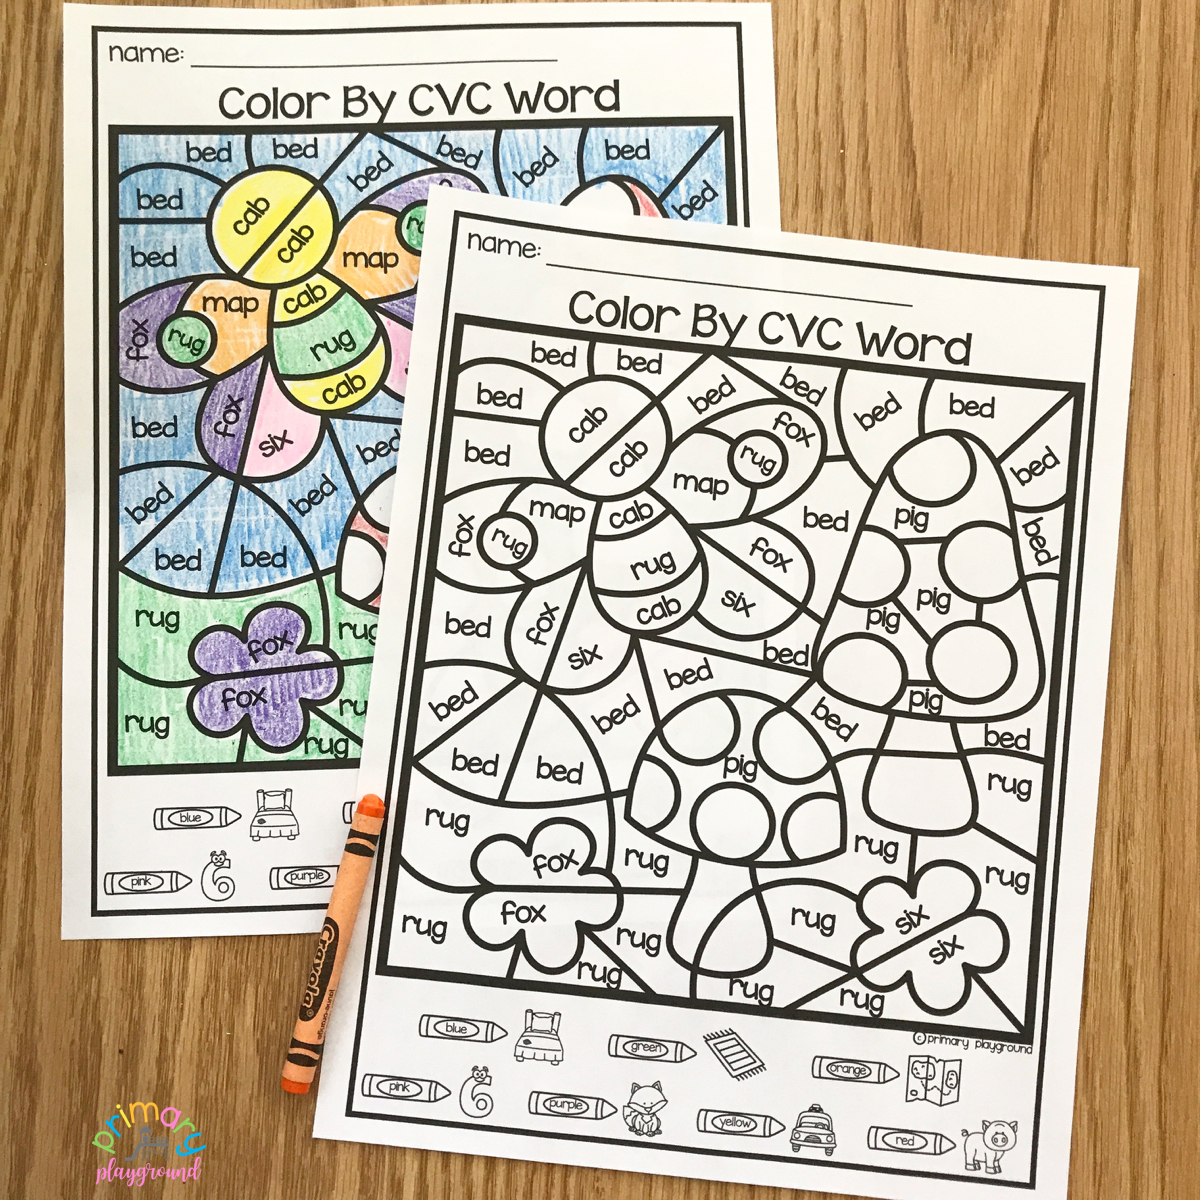 Free Printable Colorcode Cvc Words - Primary Playground - Free Printable Cvc Words With Pictures